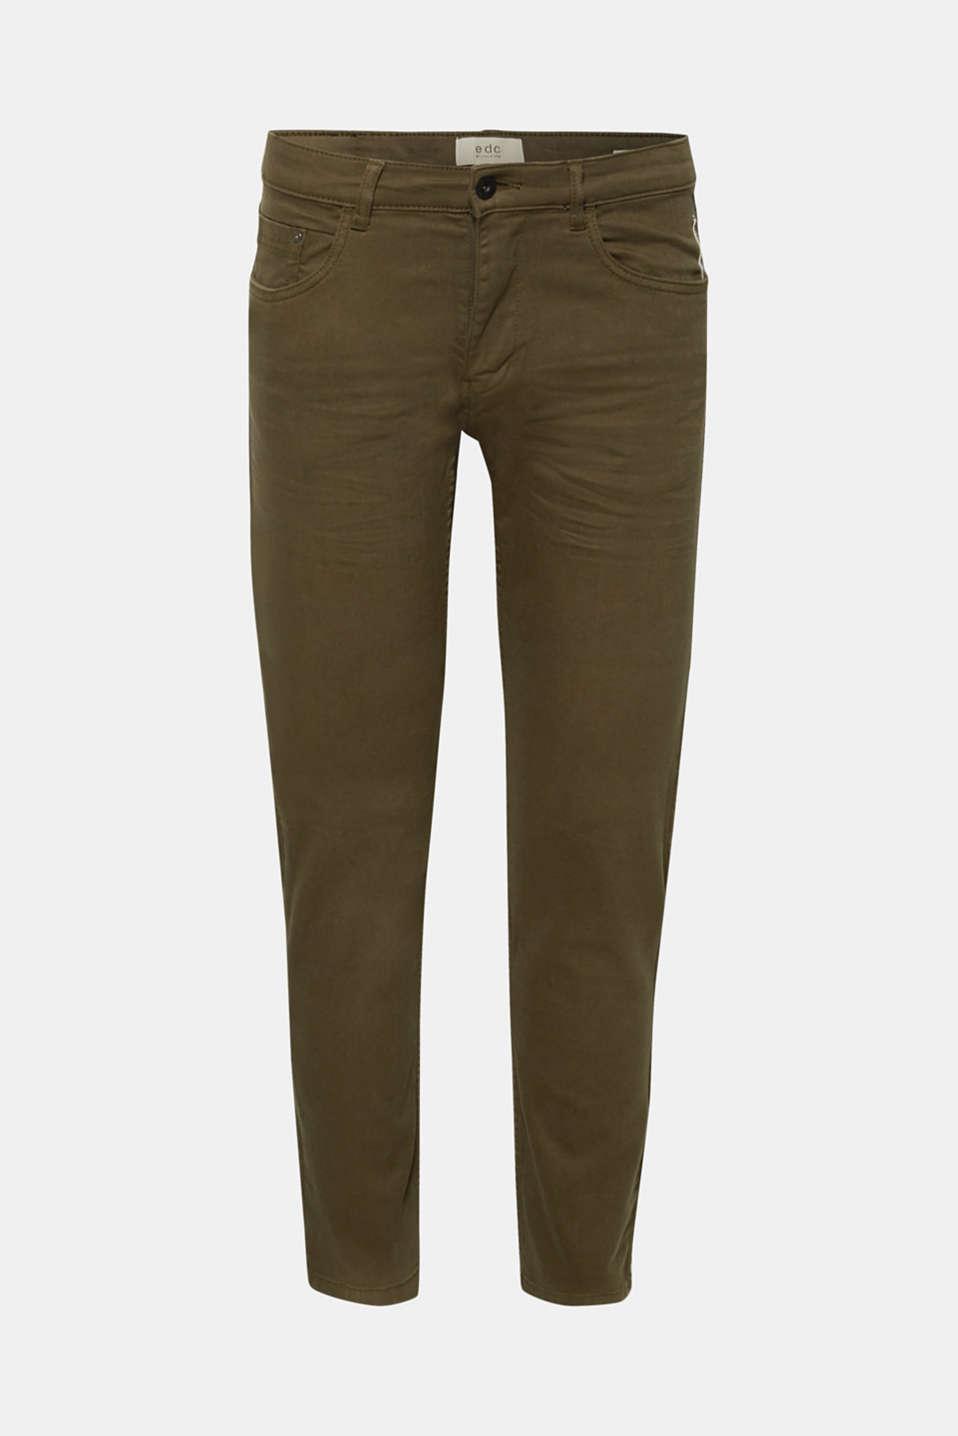 Stretch jeans in coloured denim, DARK KHAKI, detail image number 5